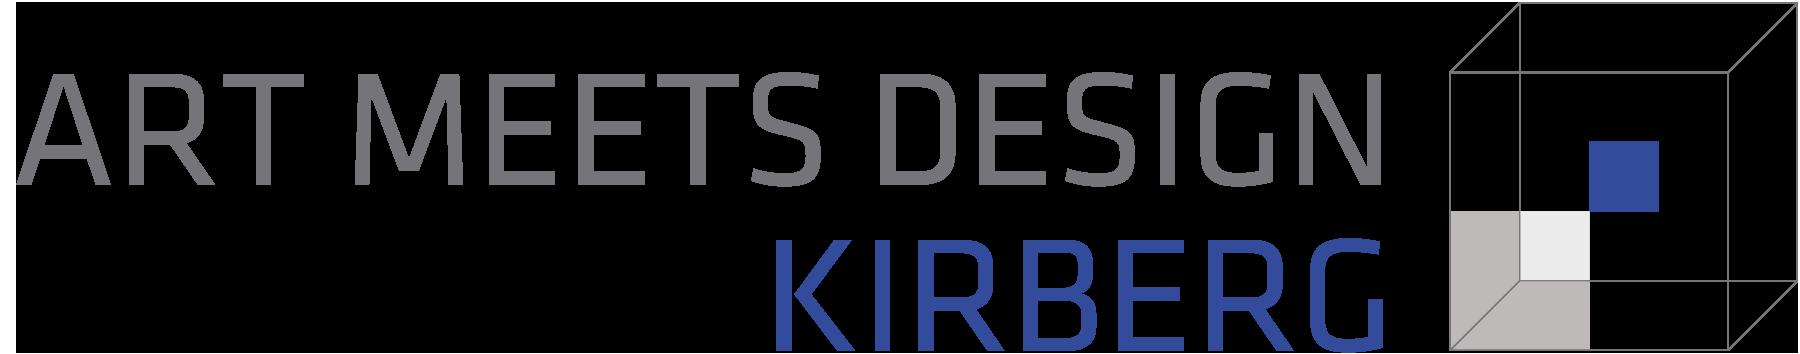 ART MEETS DESIGN - KIRBERG